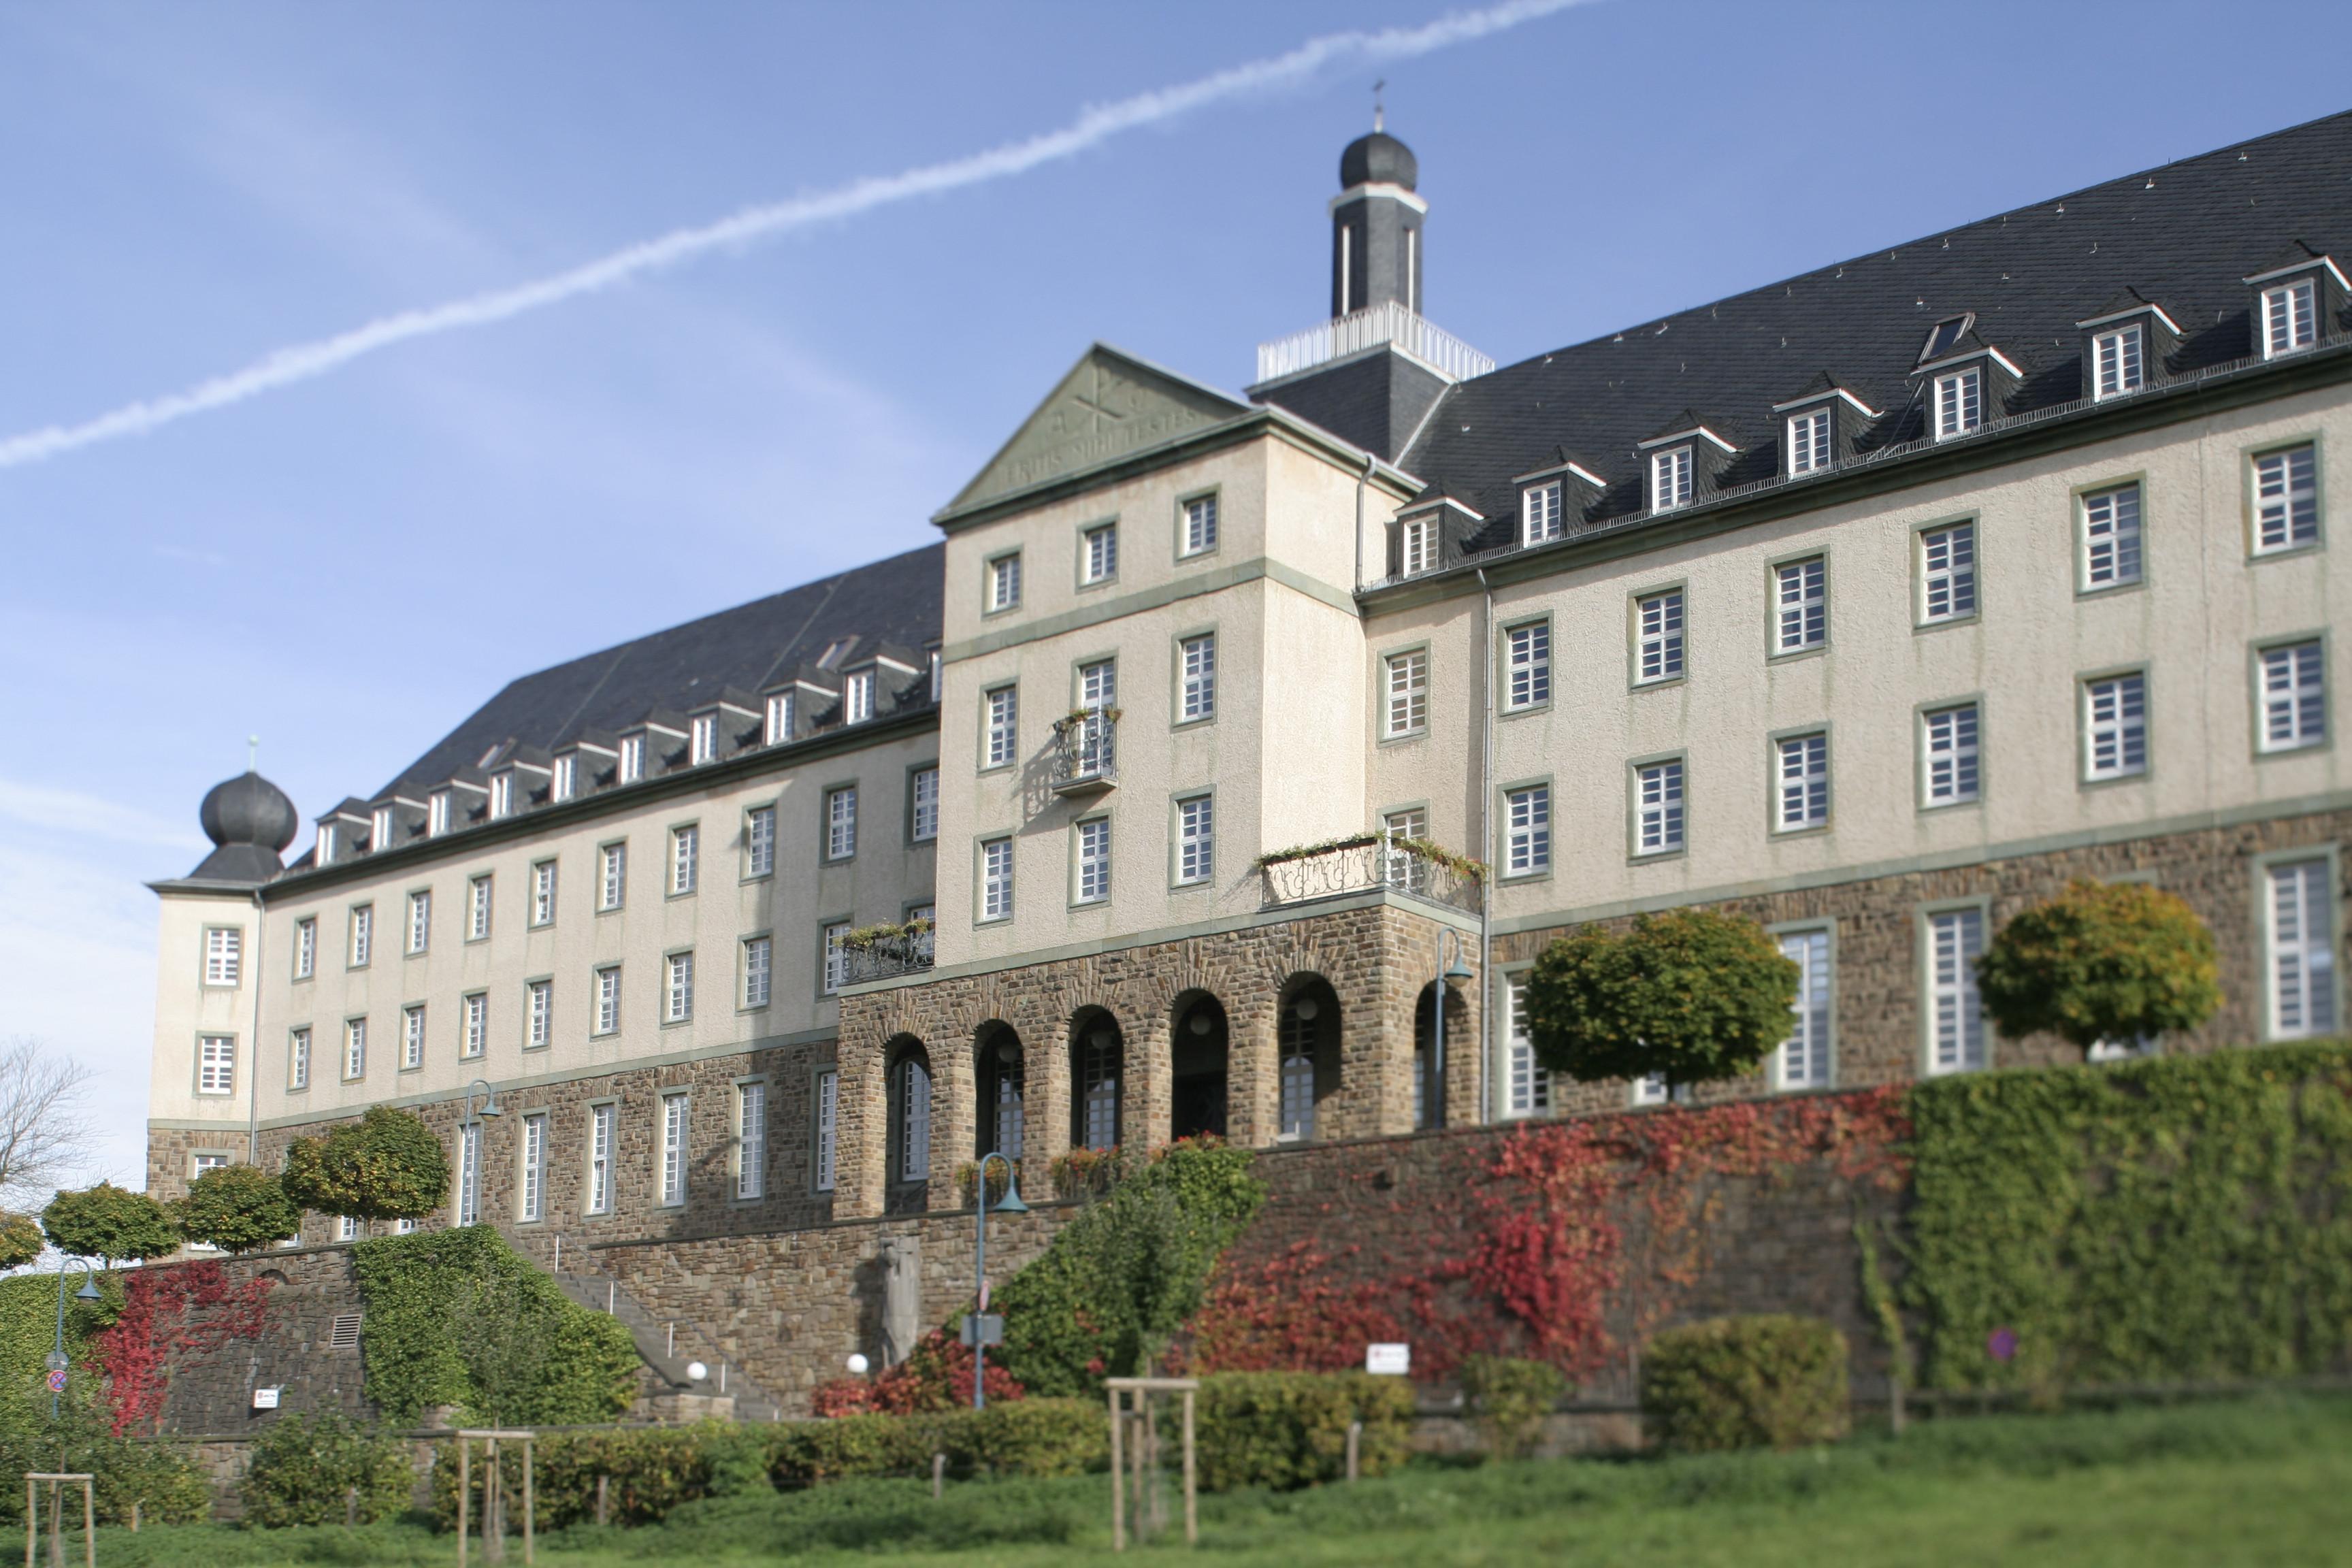 Kardinal Schulte Haus Bensberg  Veranstaltungen AUC